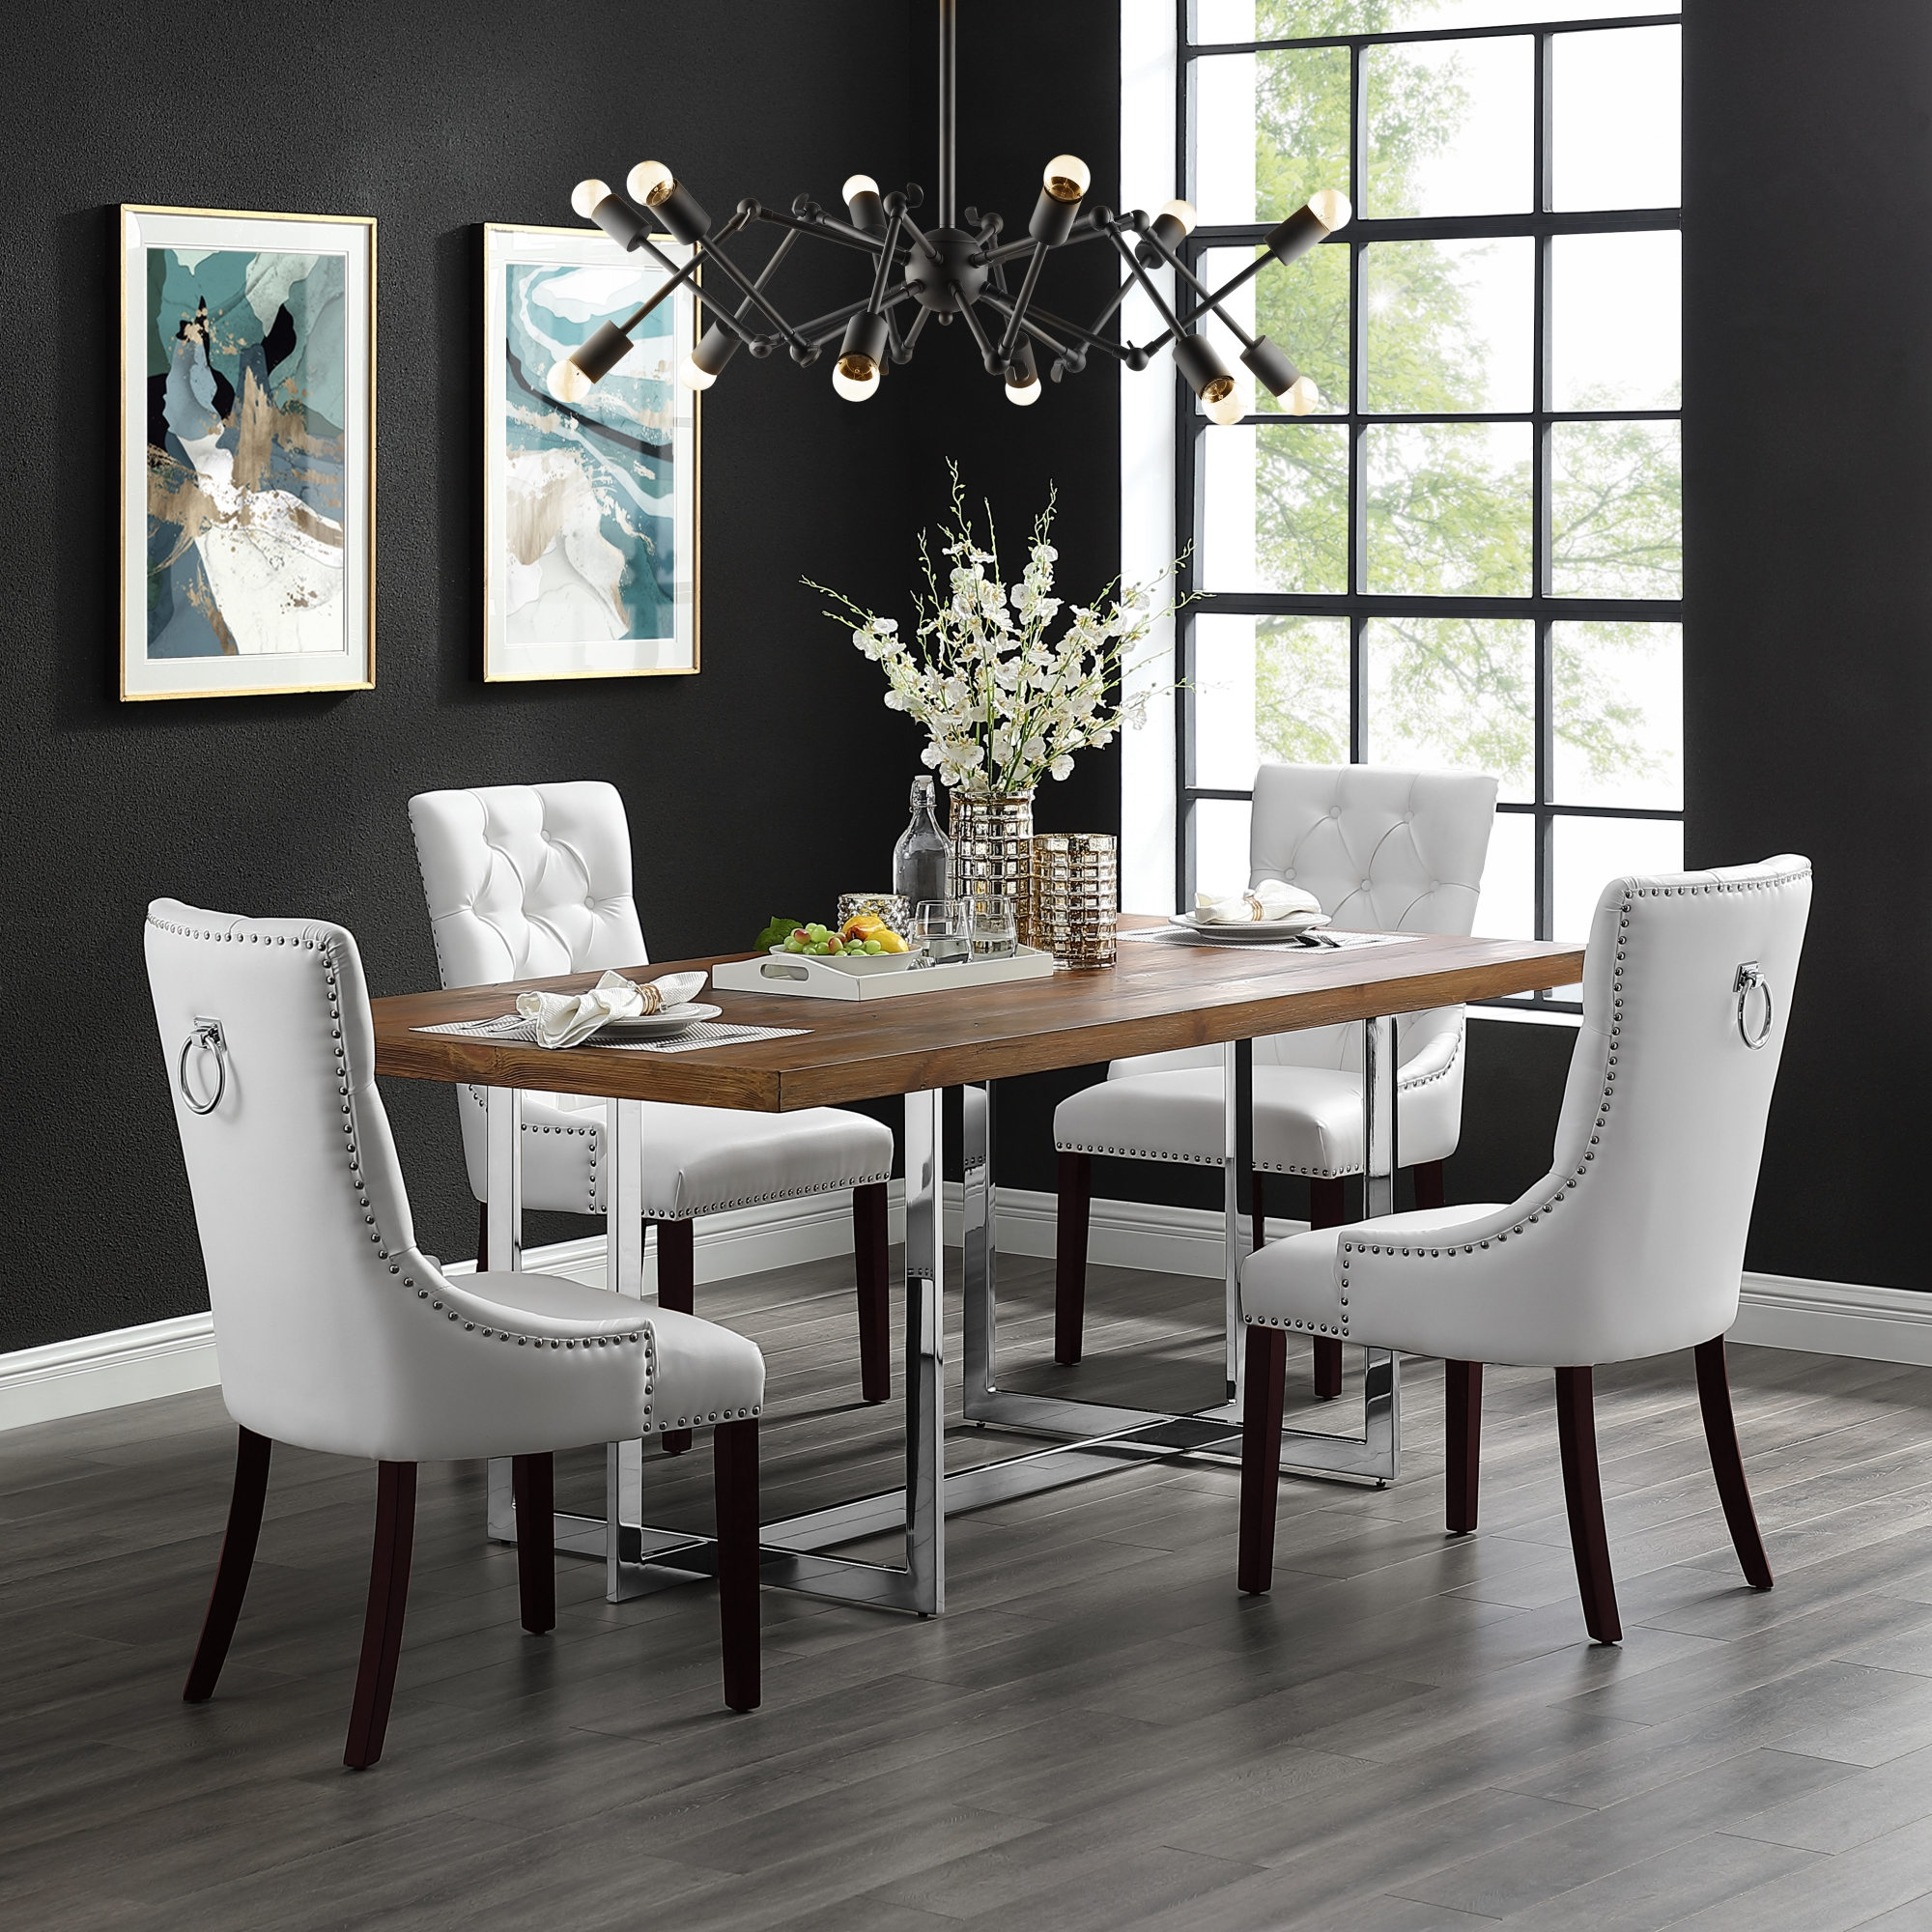 Inspired Home Faith Leather Pu Dining Chair Set Of 2 Tufted Ring Handle Chrome Nailhead Finish White Walmart Com Walmart Com